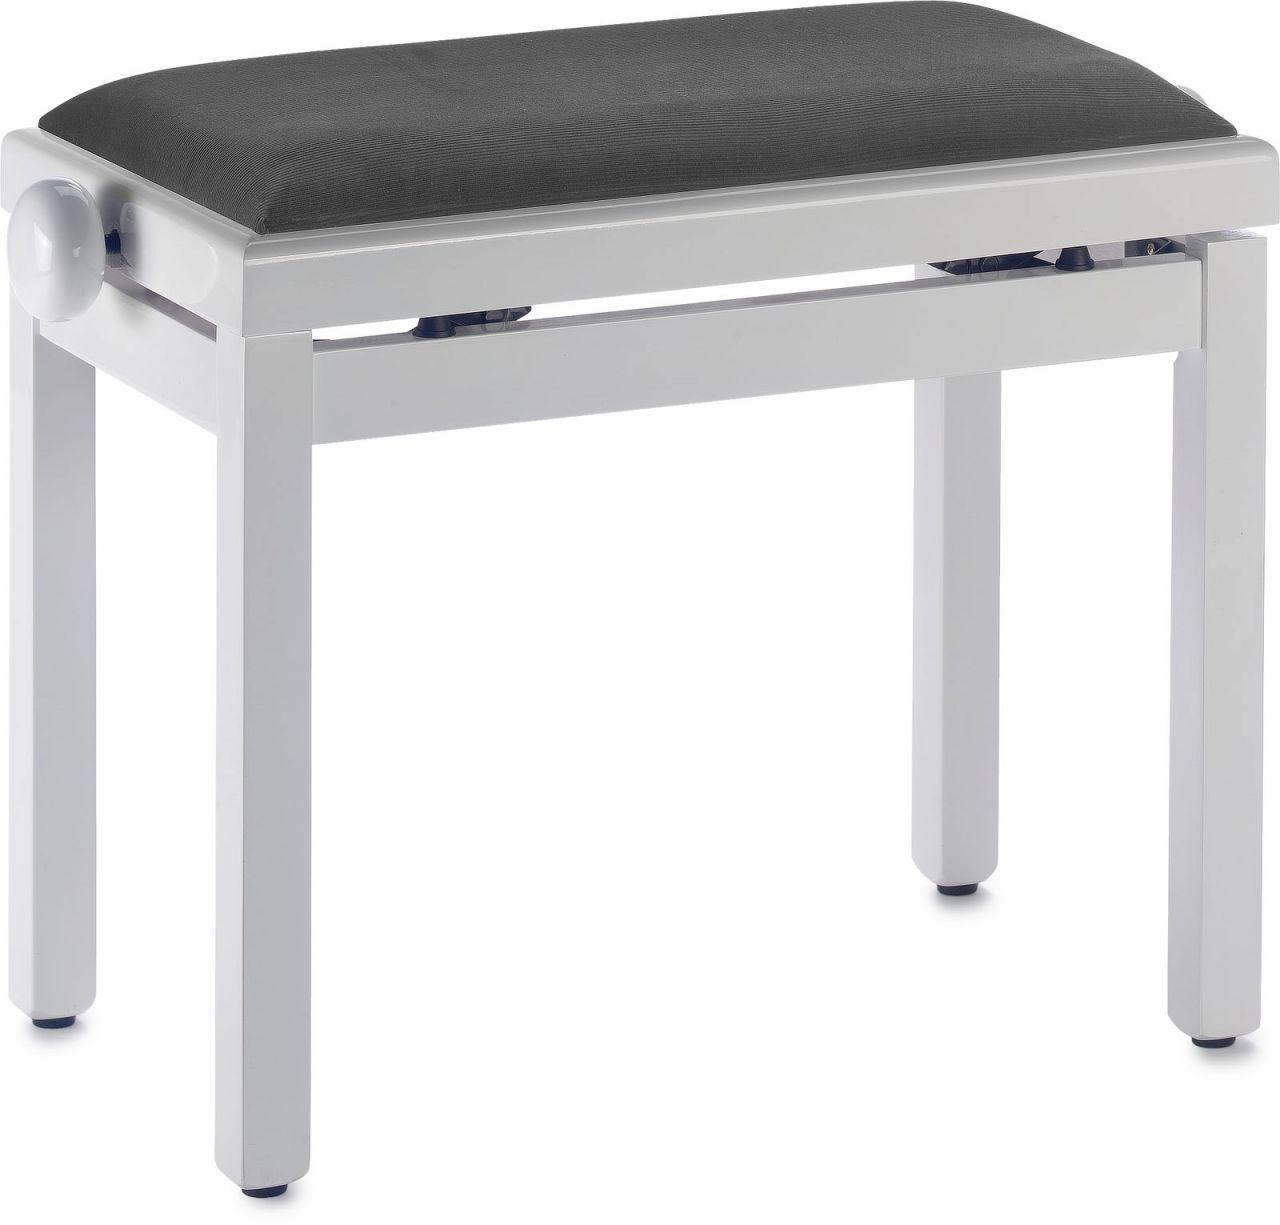 Sonstige Pianobank - Klavierbank - Klavierhocker - weiss hochglanz poliert PB39 WHP V/BK